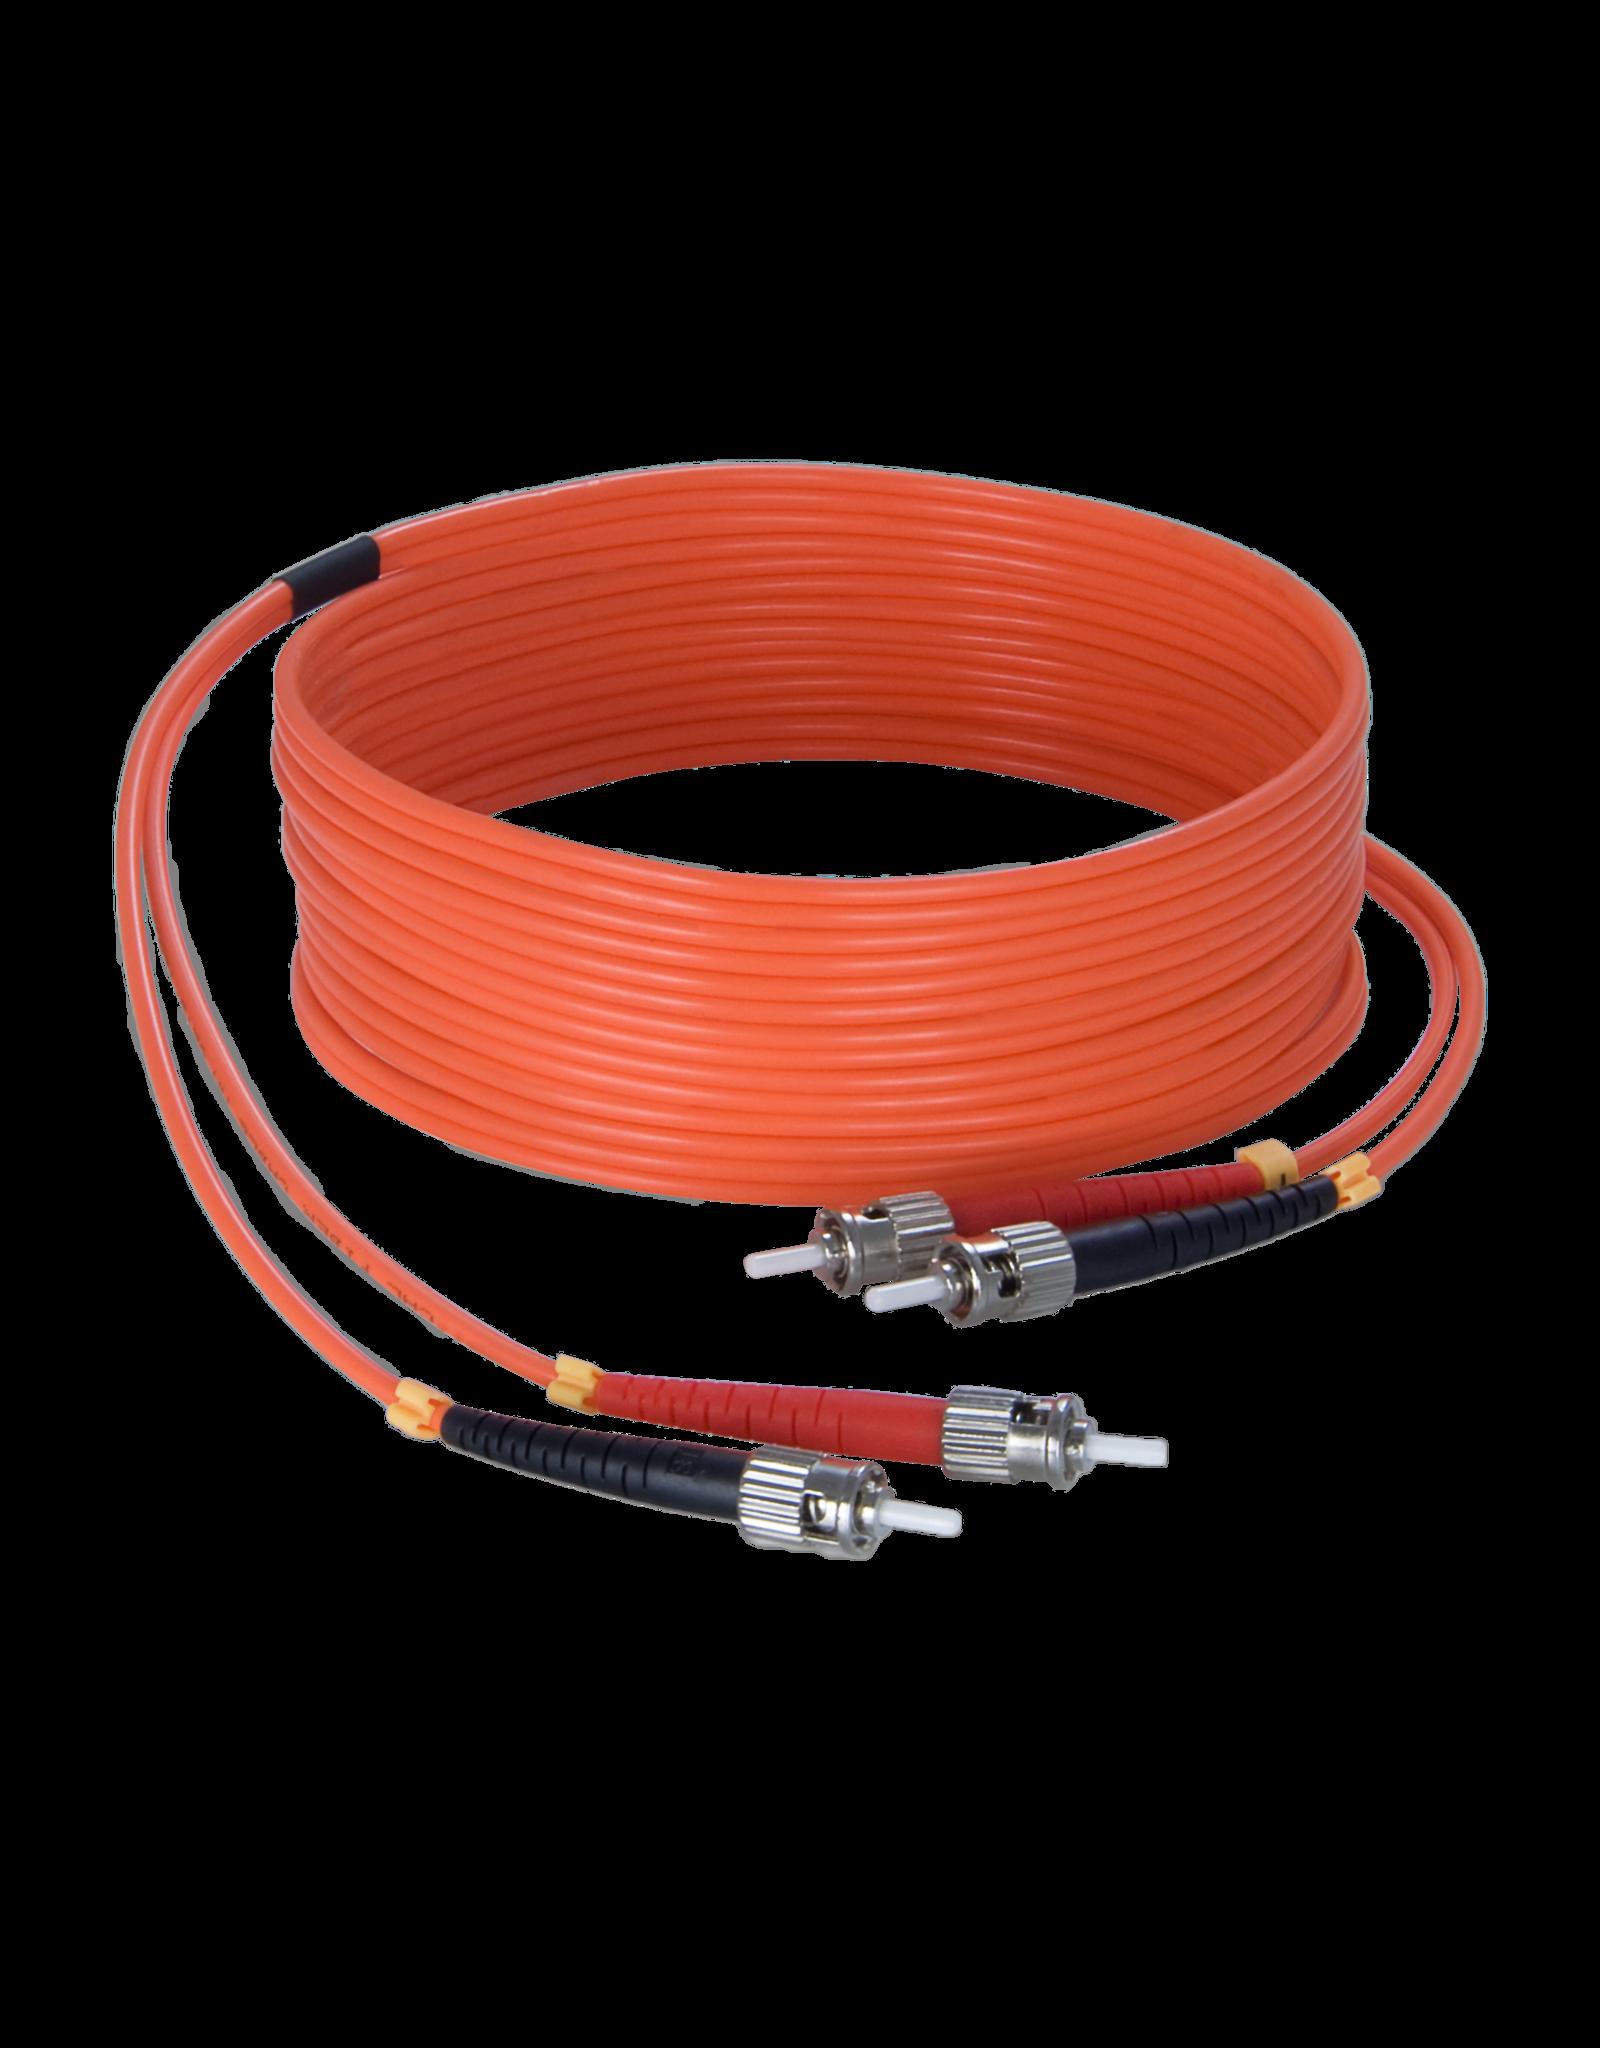 Audac Fiber optic cable - st/pc - st/pc - LSHF 60 meter